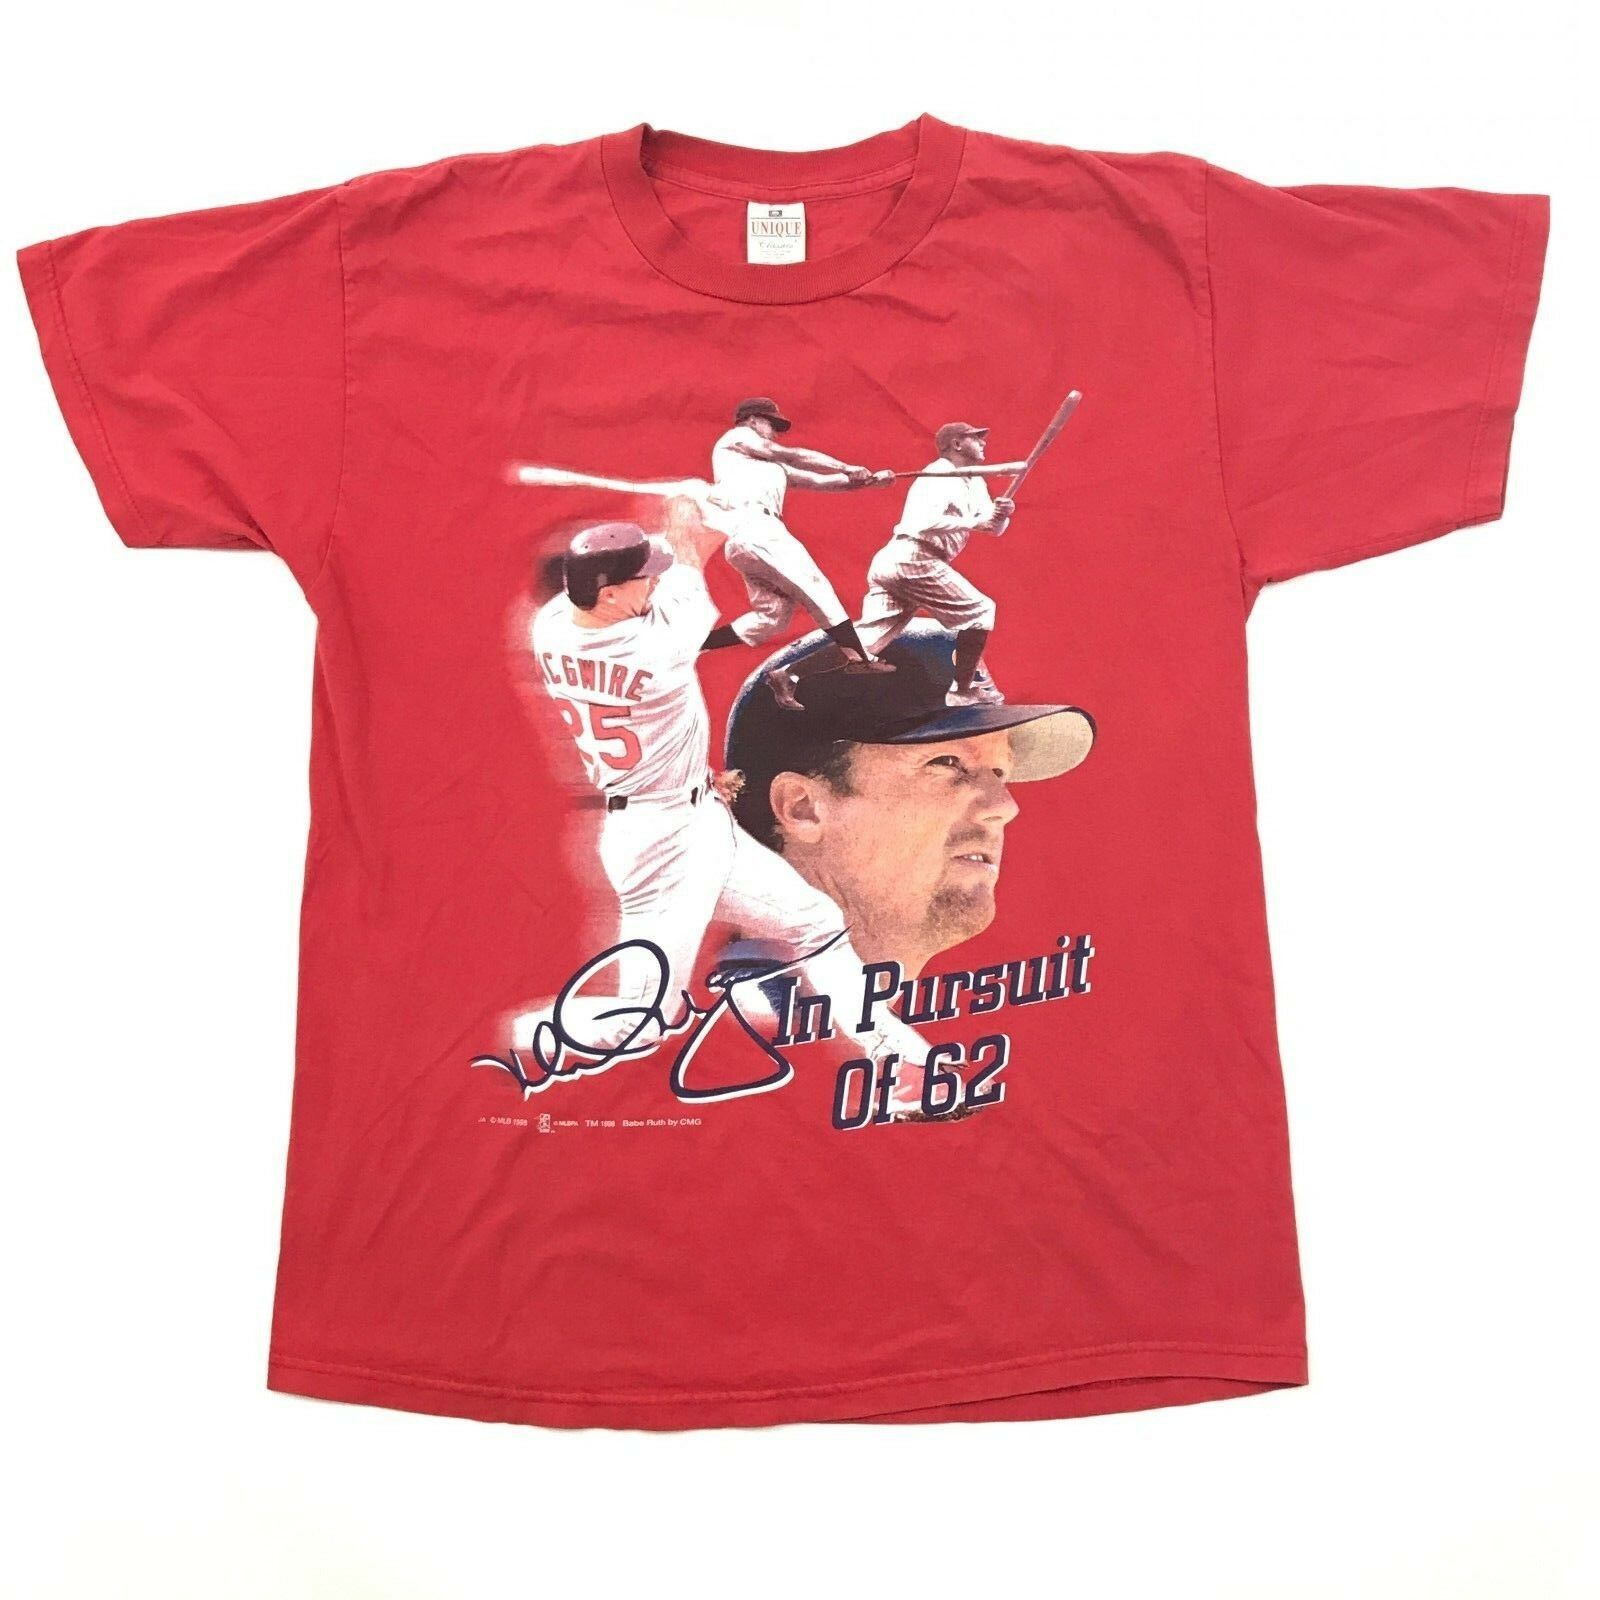 Vintage Babe Ruth T-Shirt T-Shirt T-Shirt Mark Mcgwire T-Shirt Größe L Kurzärmlig Unique 1998     | Gutes Design  d00a8a